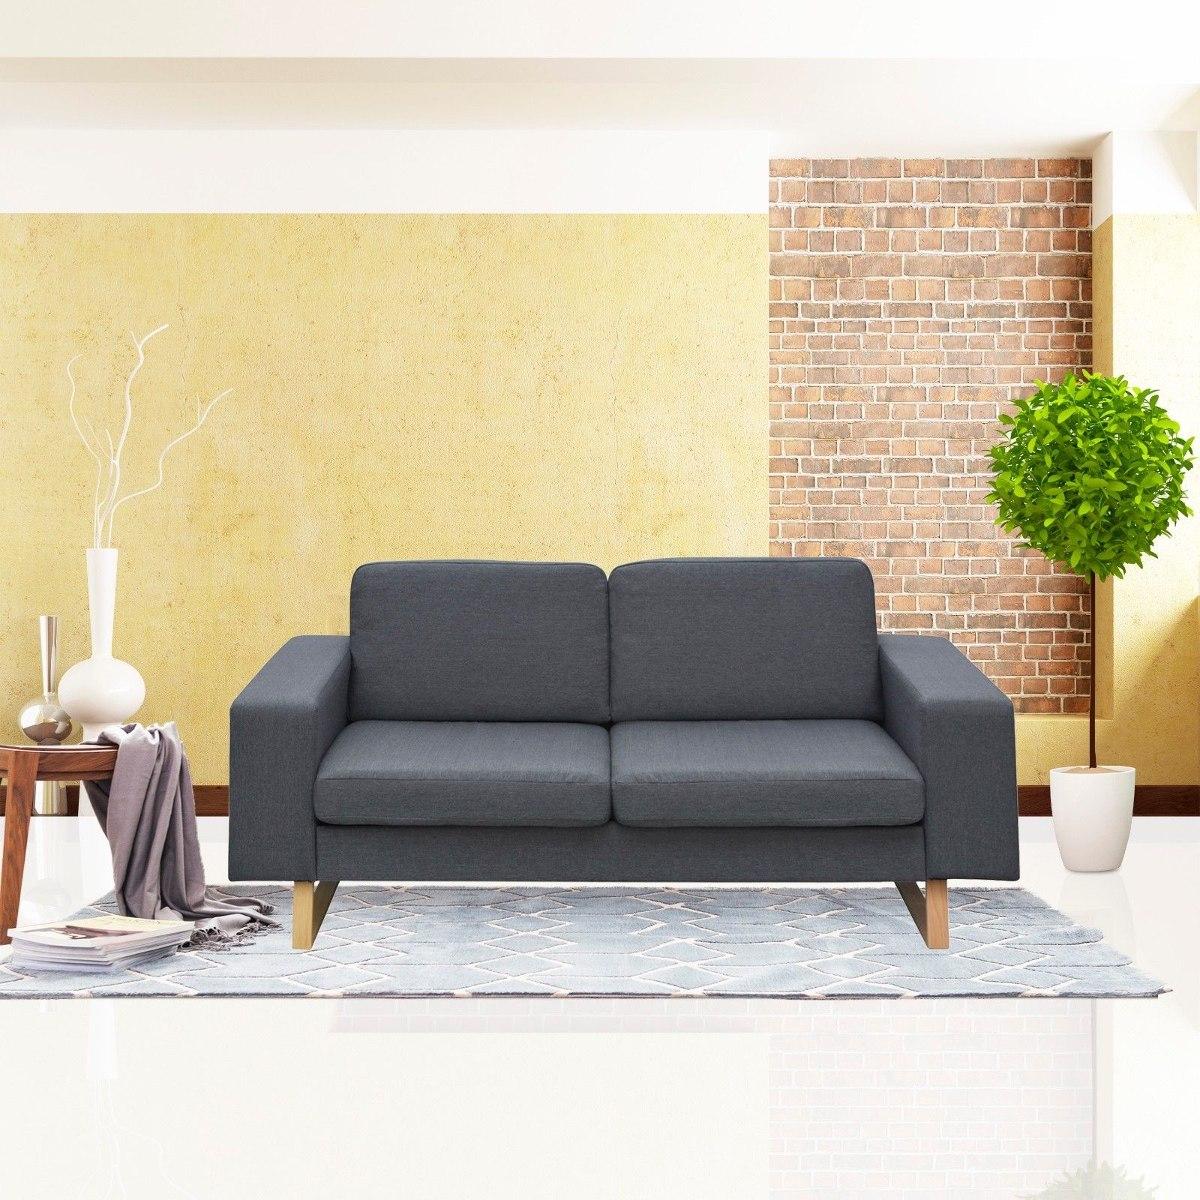 Muebles de sala de estar sof de dos plazas tela sof sof for Muebles industriales sala de estar